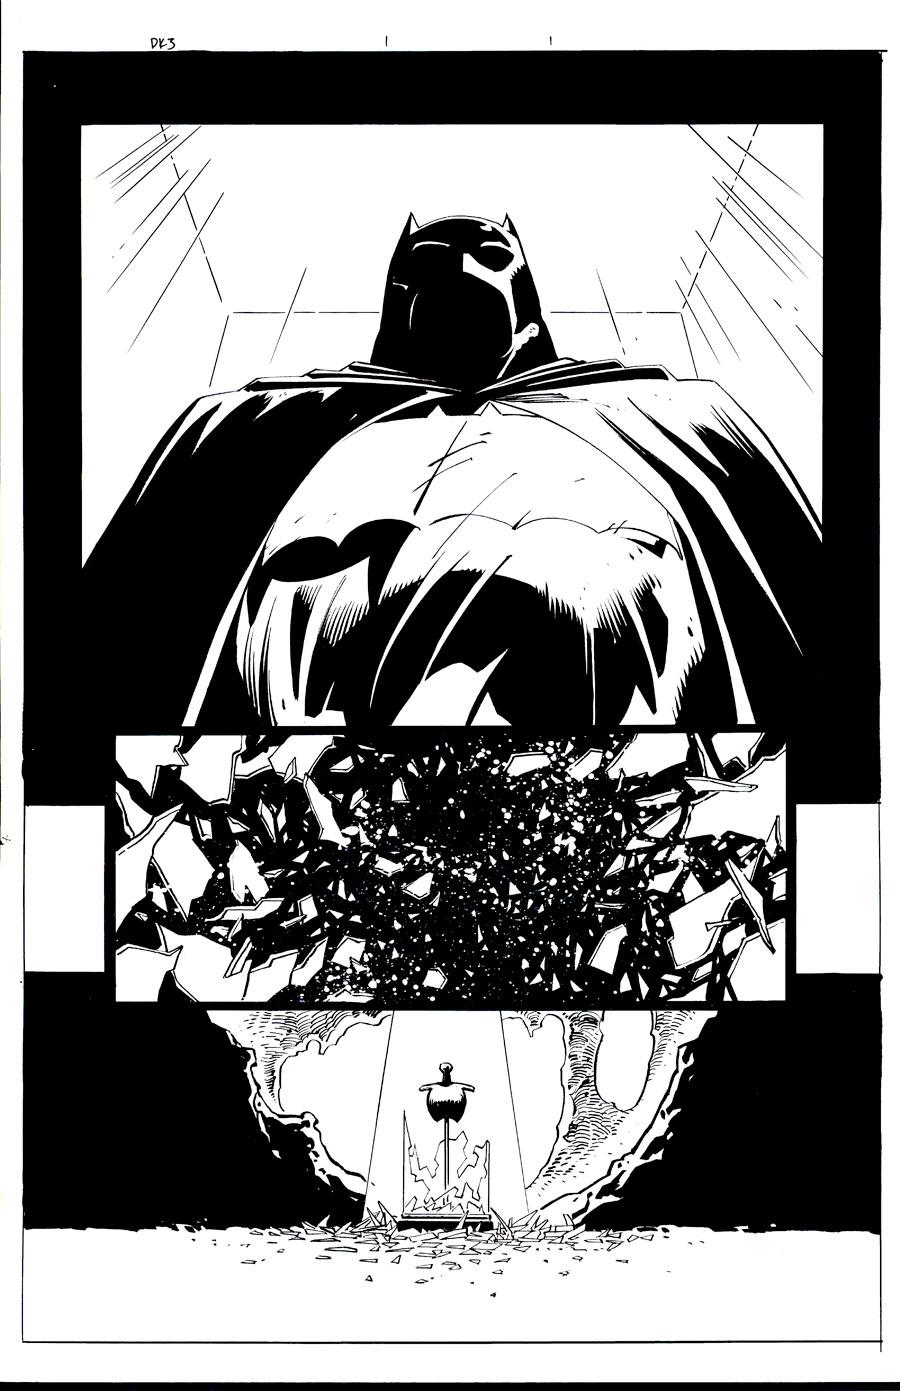 DARK KNIGHT III: THE MASTER RACE #1 - ¡Avance! | Comicrítico